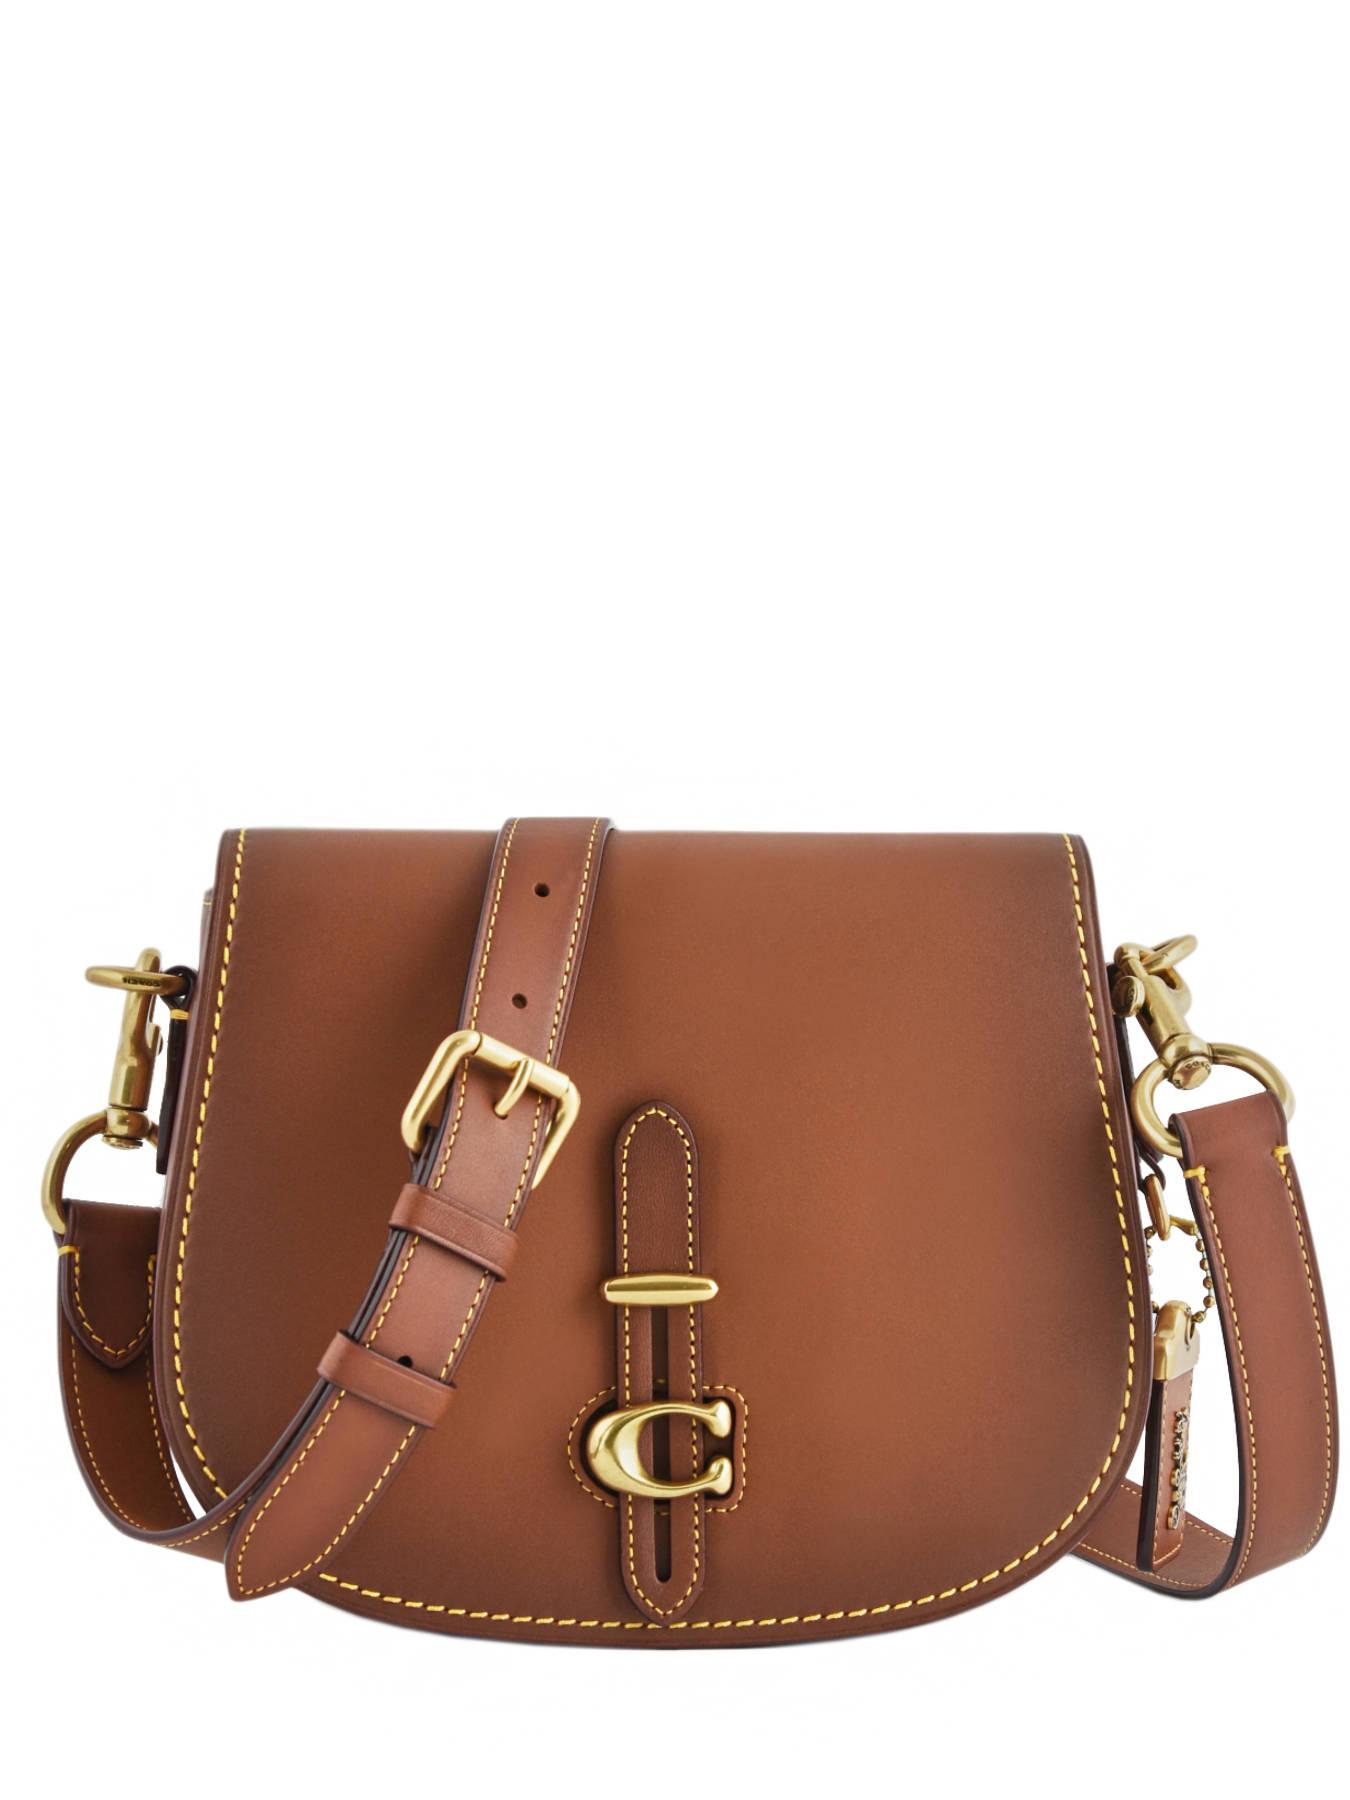 26c9ea355be1 ... Crossbody Bag Saddle Bag Leather Coach Brown saddle bag 54202 ...